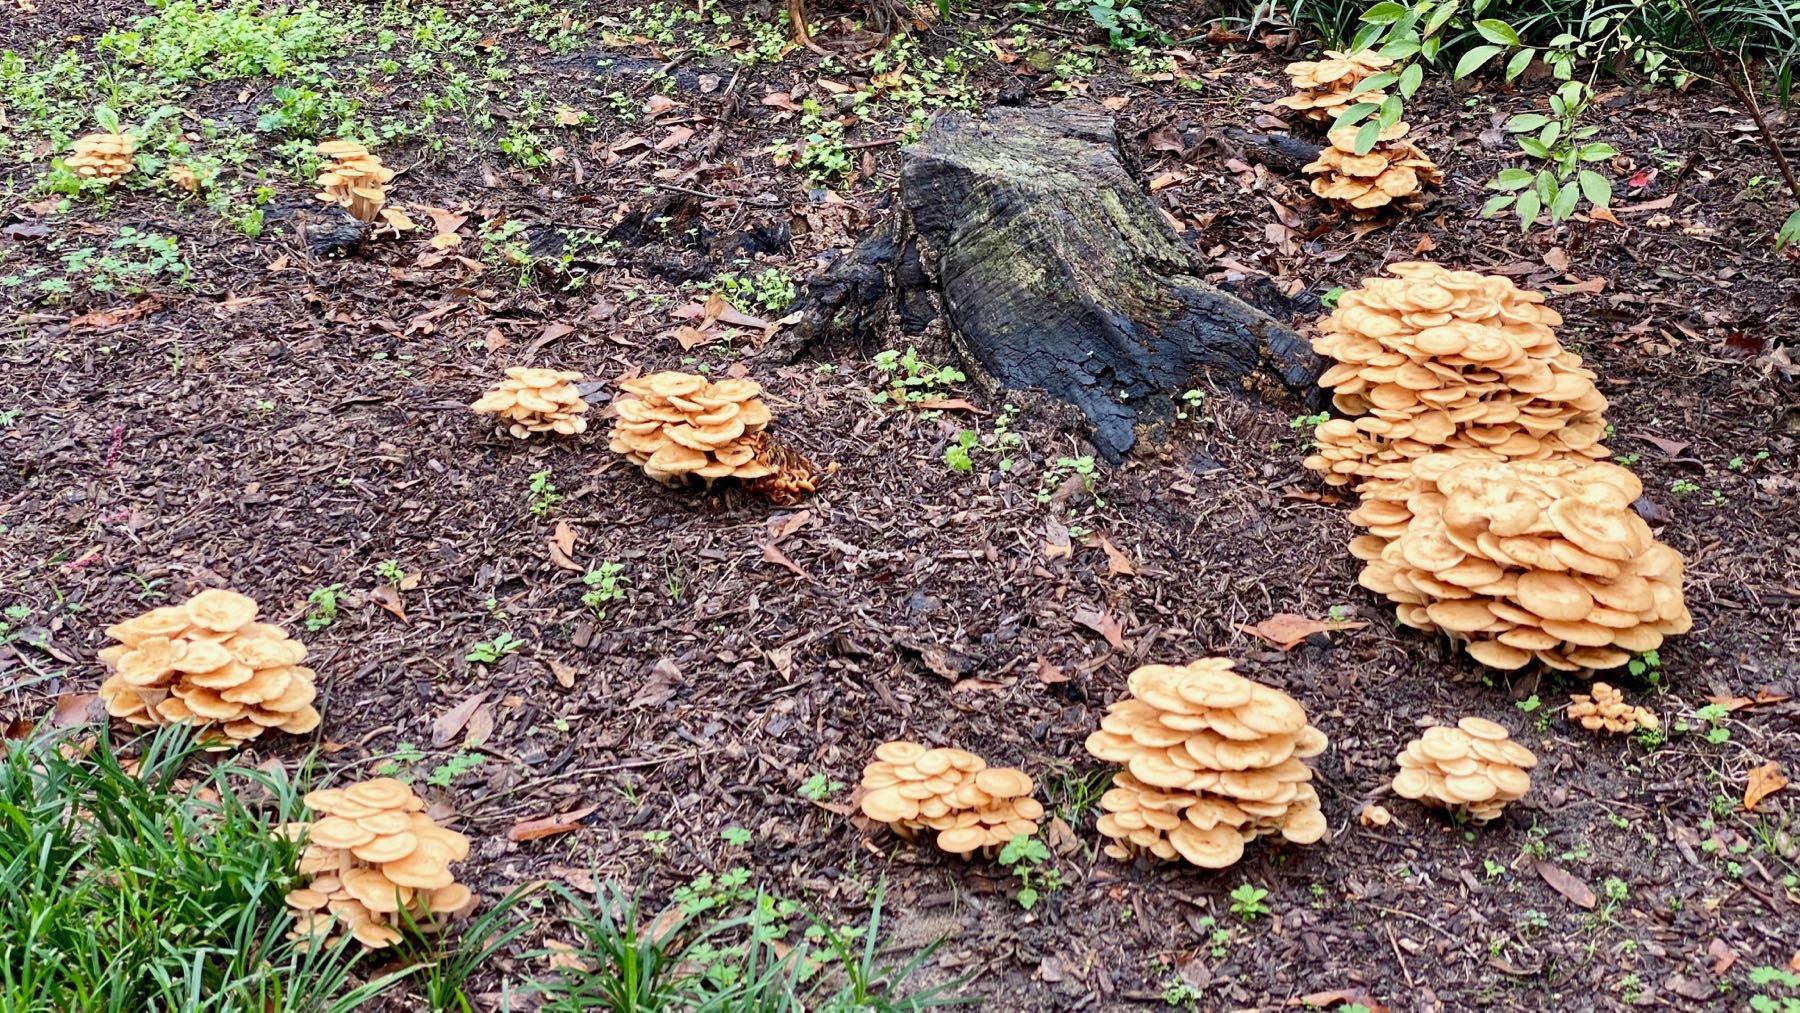 Shroom mounds